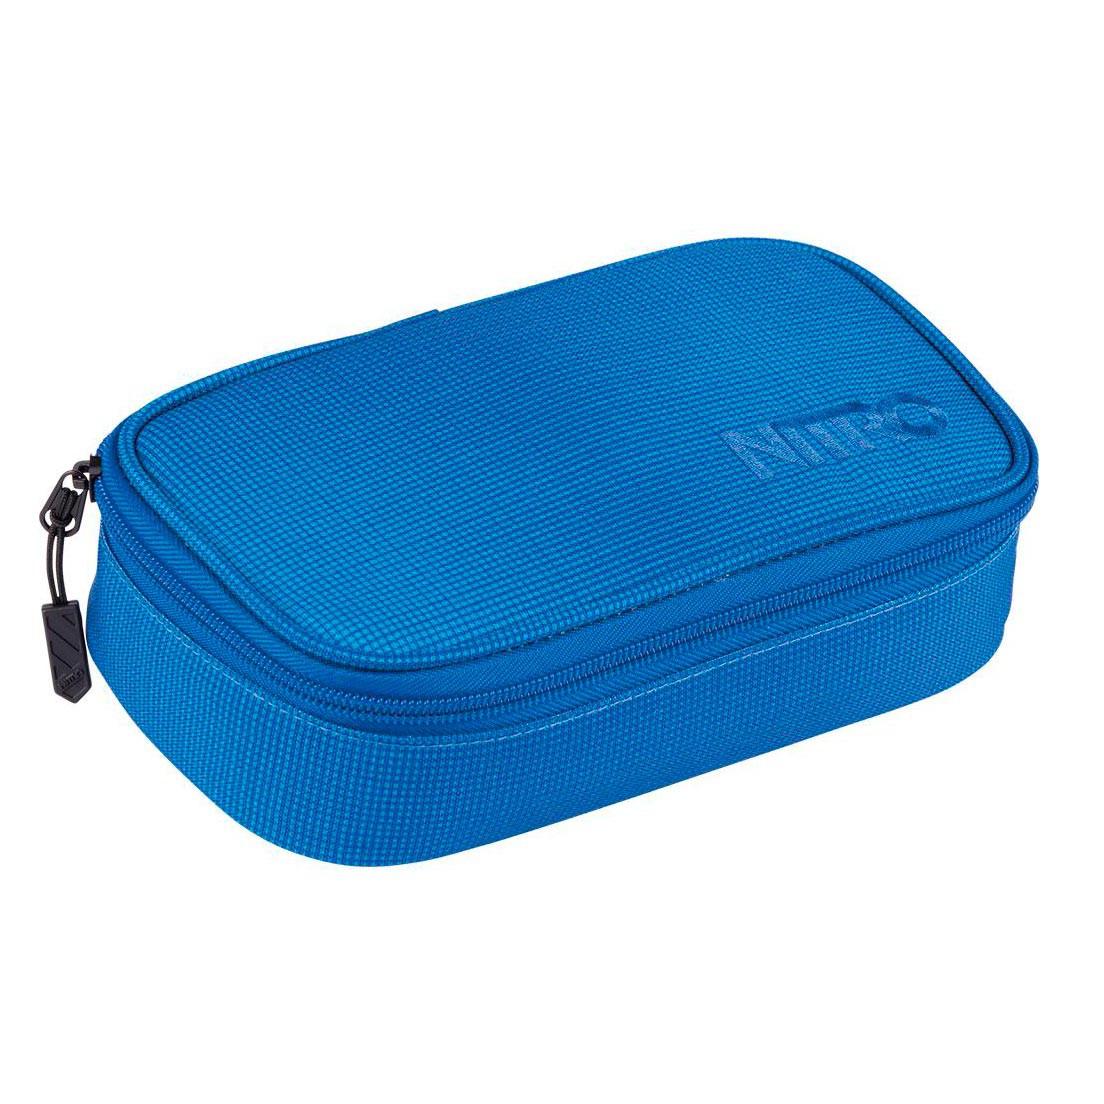 Školní pouzdro Nitro Pencil Case blur brilliant blue